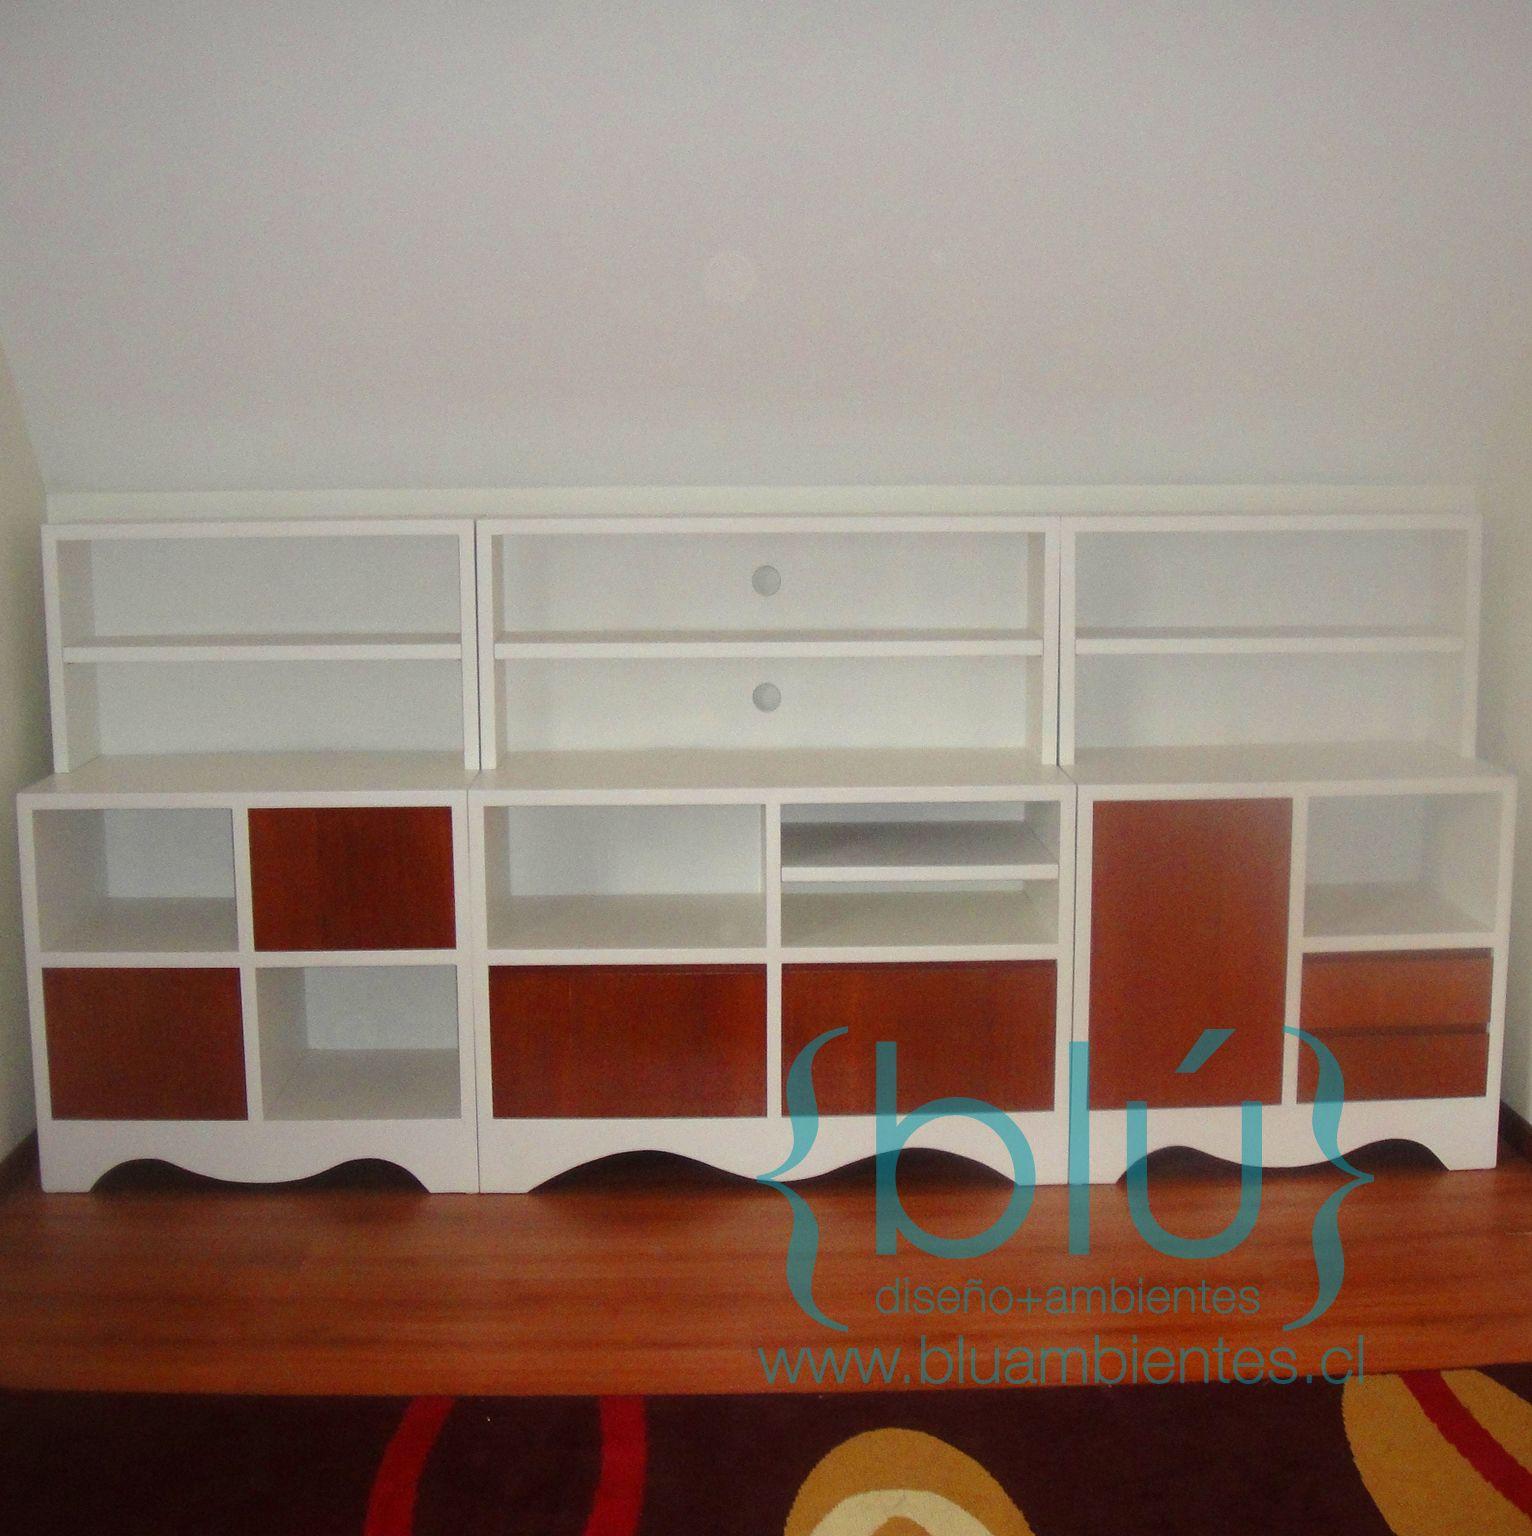 Mueble Modular Sala De Estar Lacado Con Madera Proyectos  # Muebles Modulares